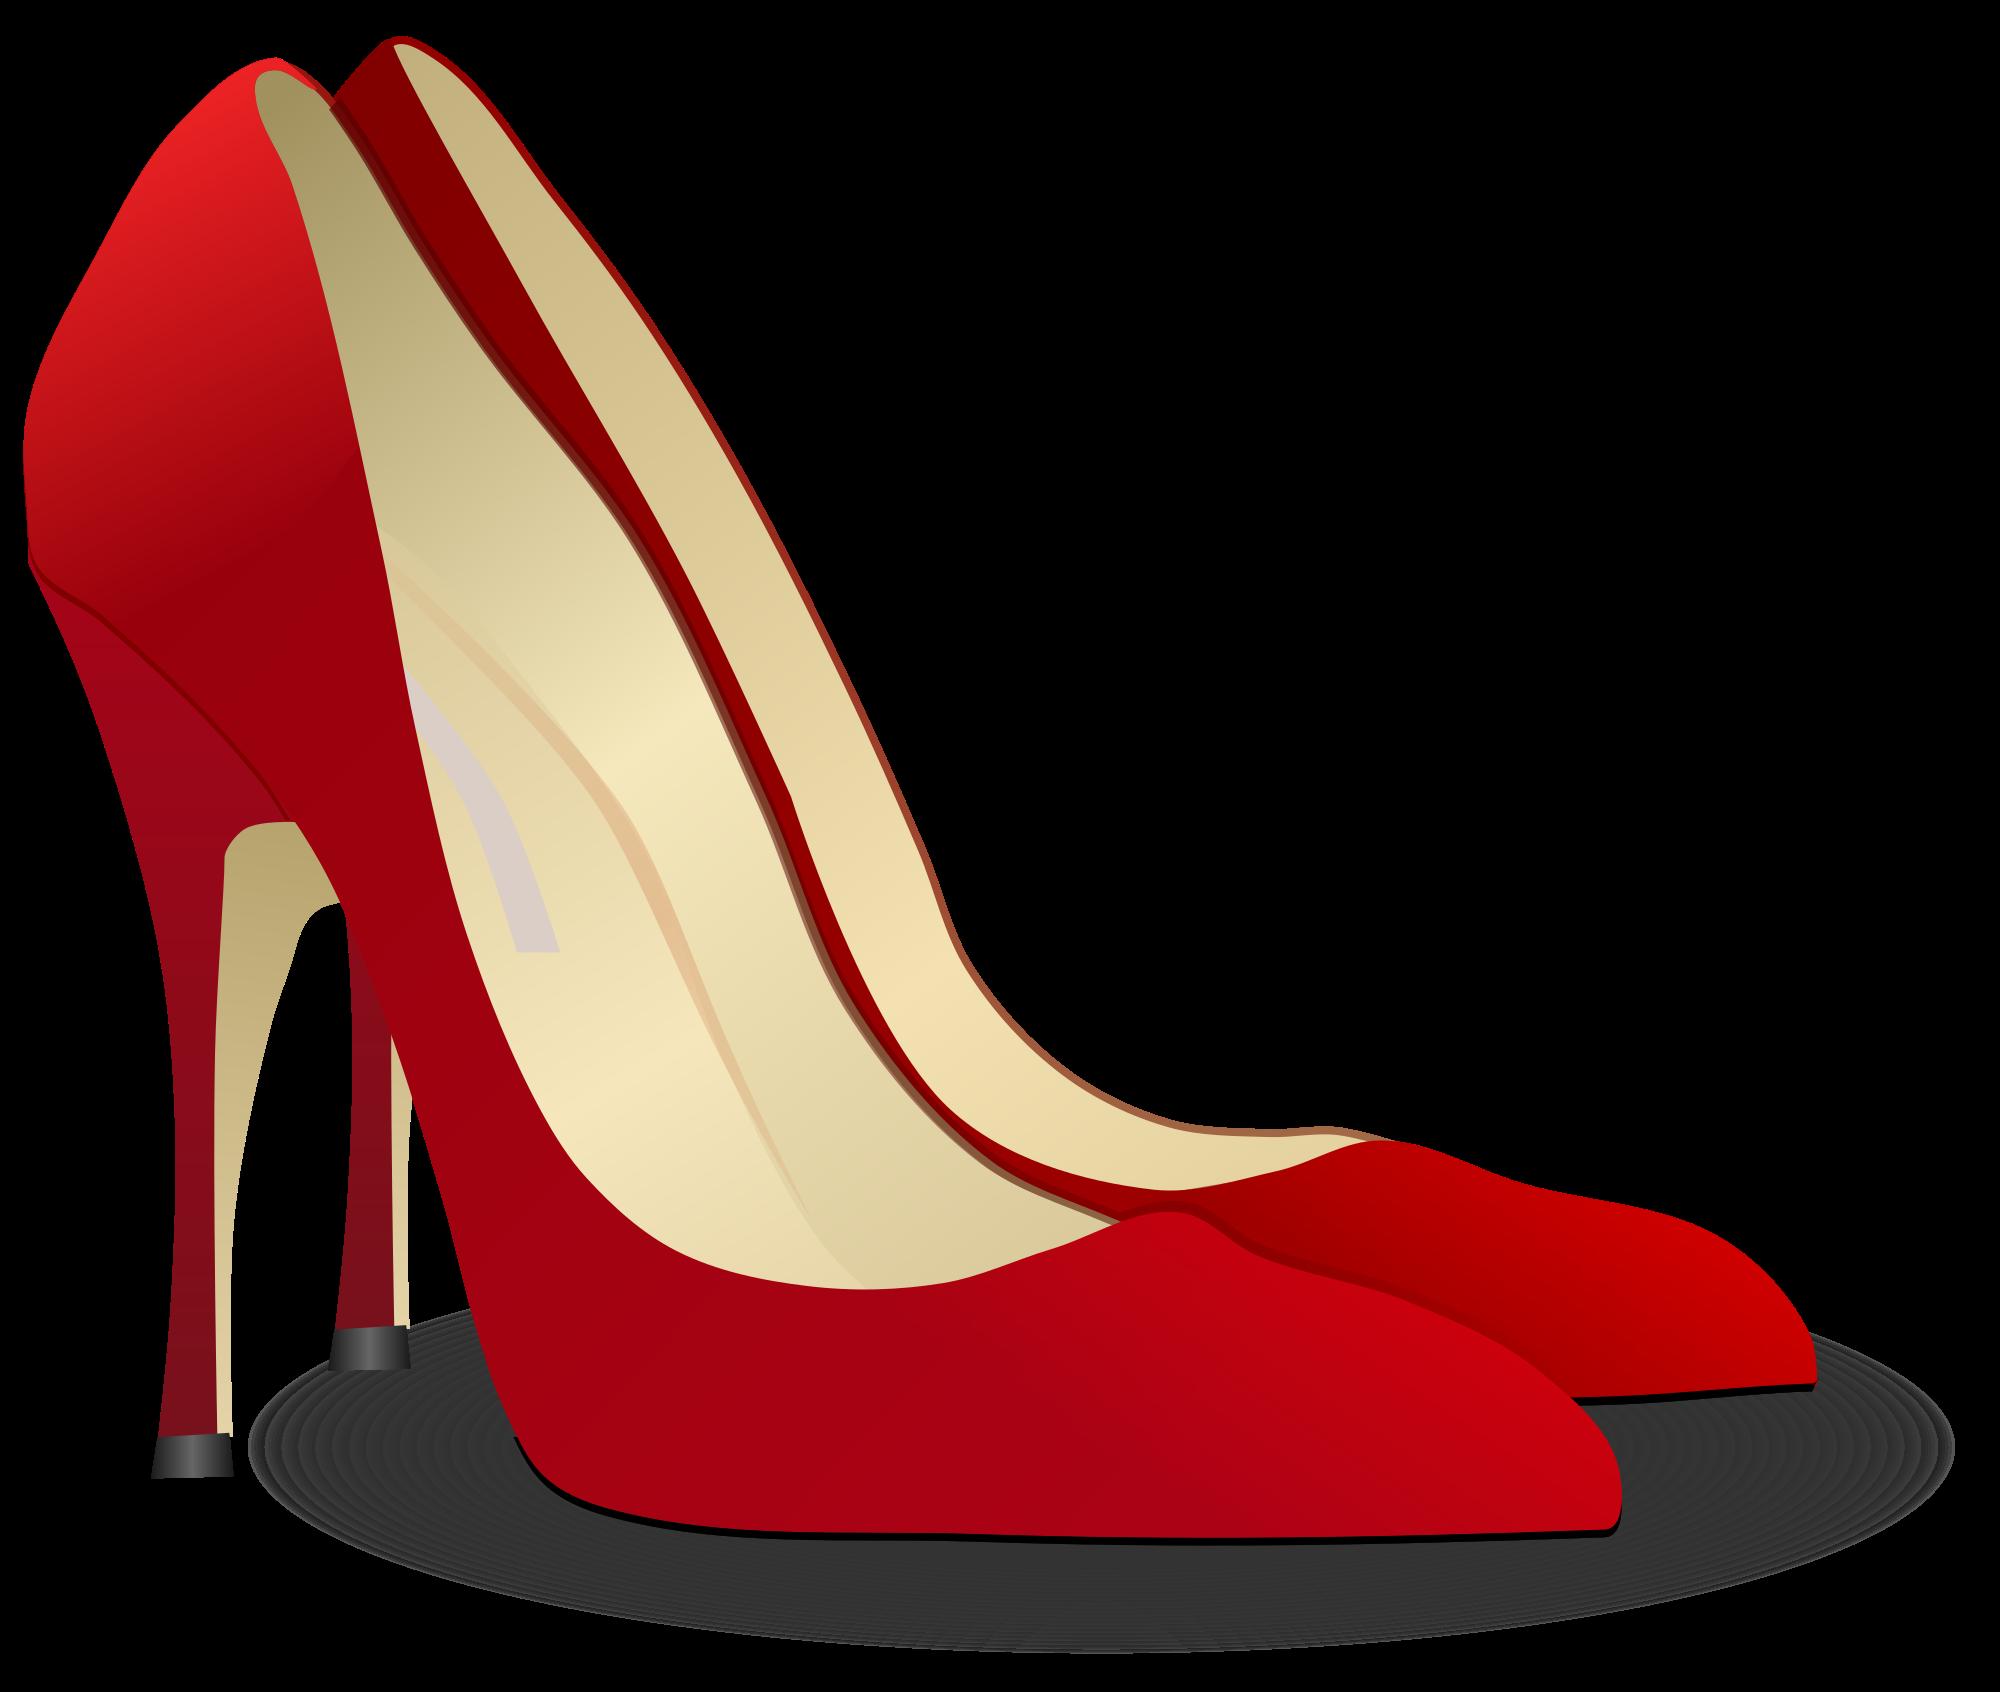 Mix It Up Monday Sing In High Heels Heels Shoes Wallpaper Pumps